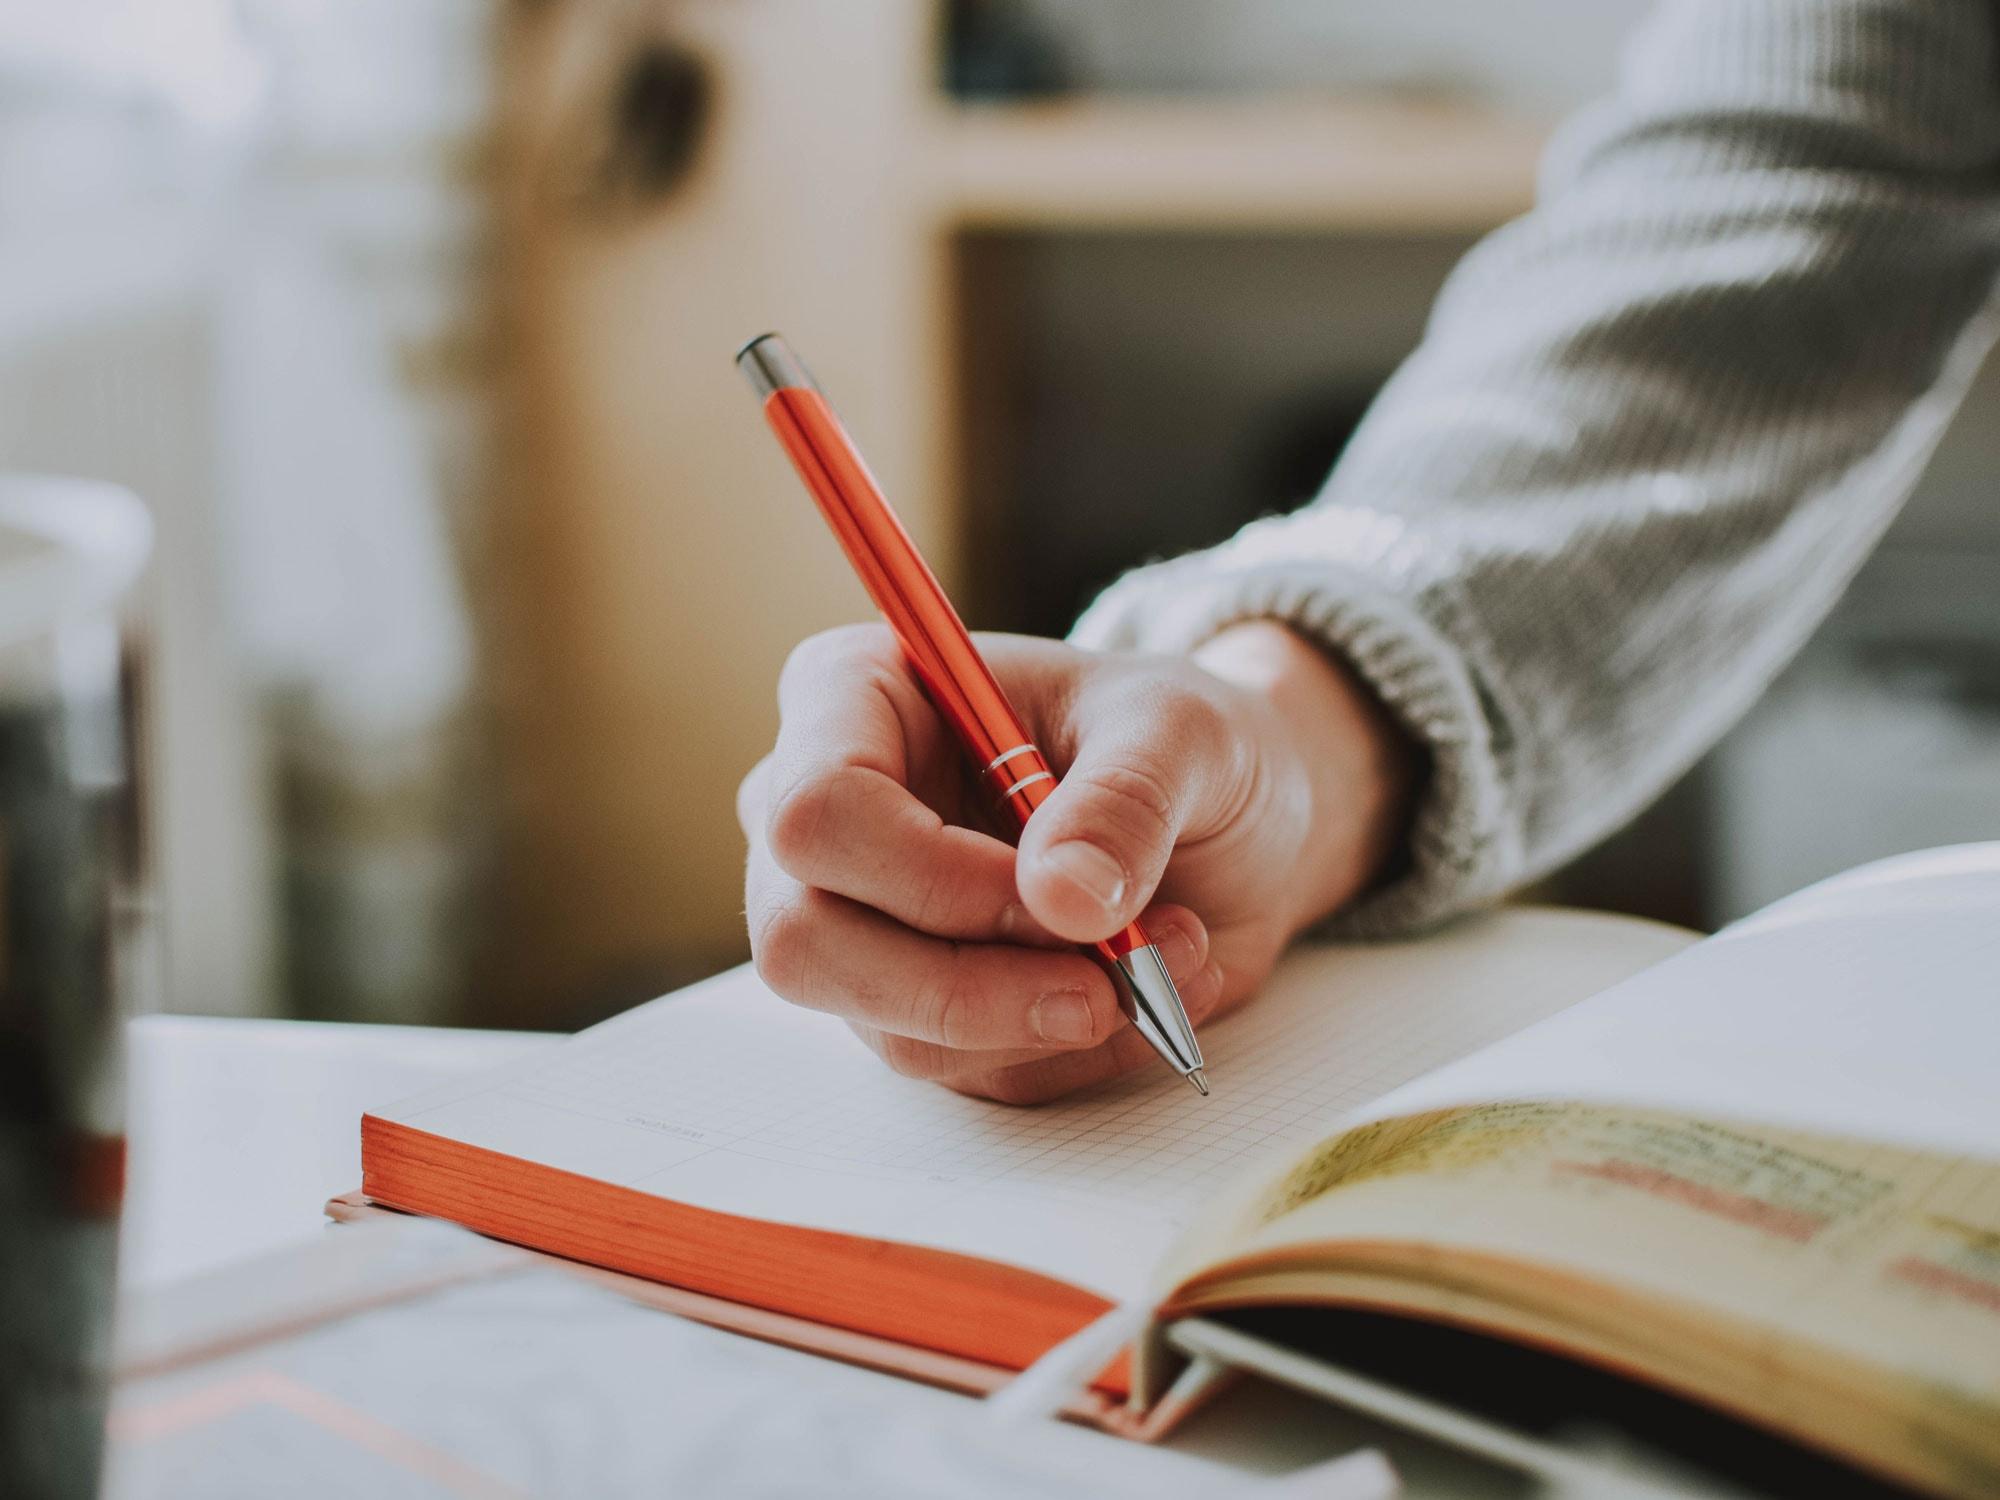 person-holding-orange-pen-1925536